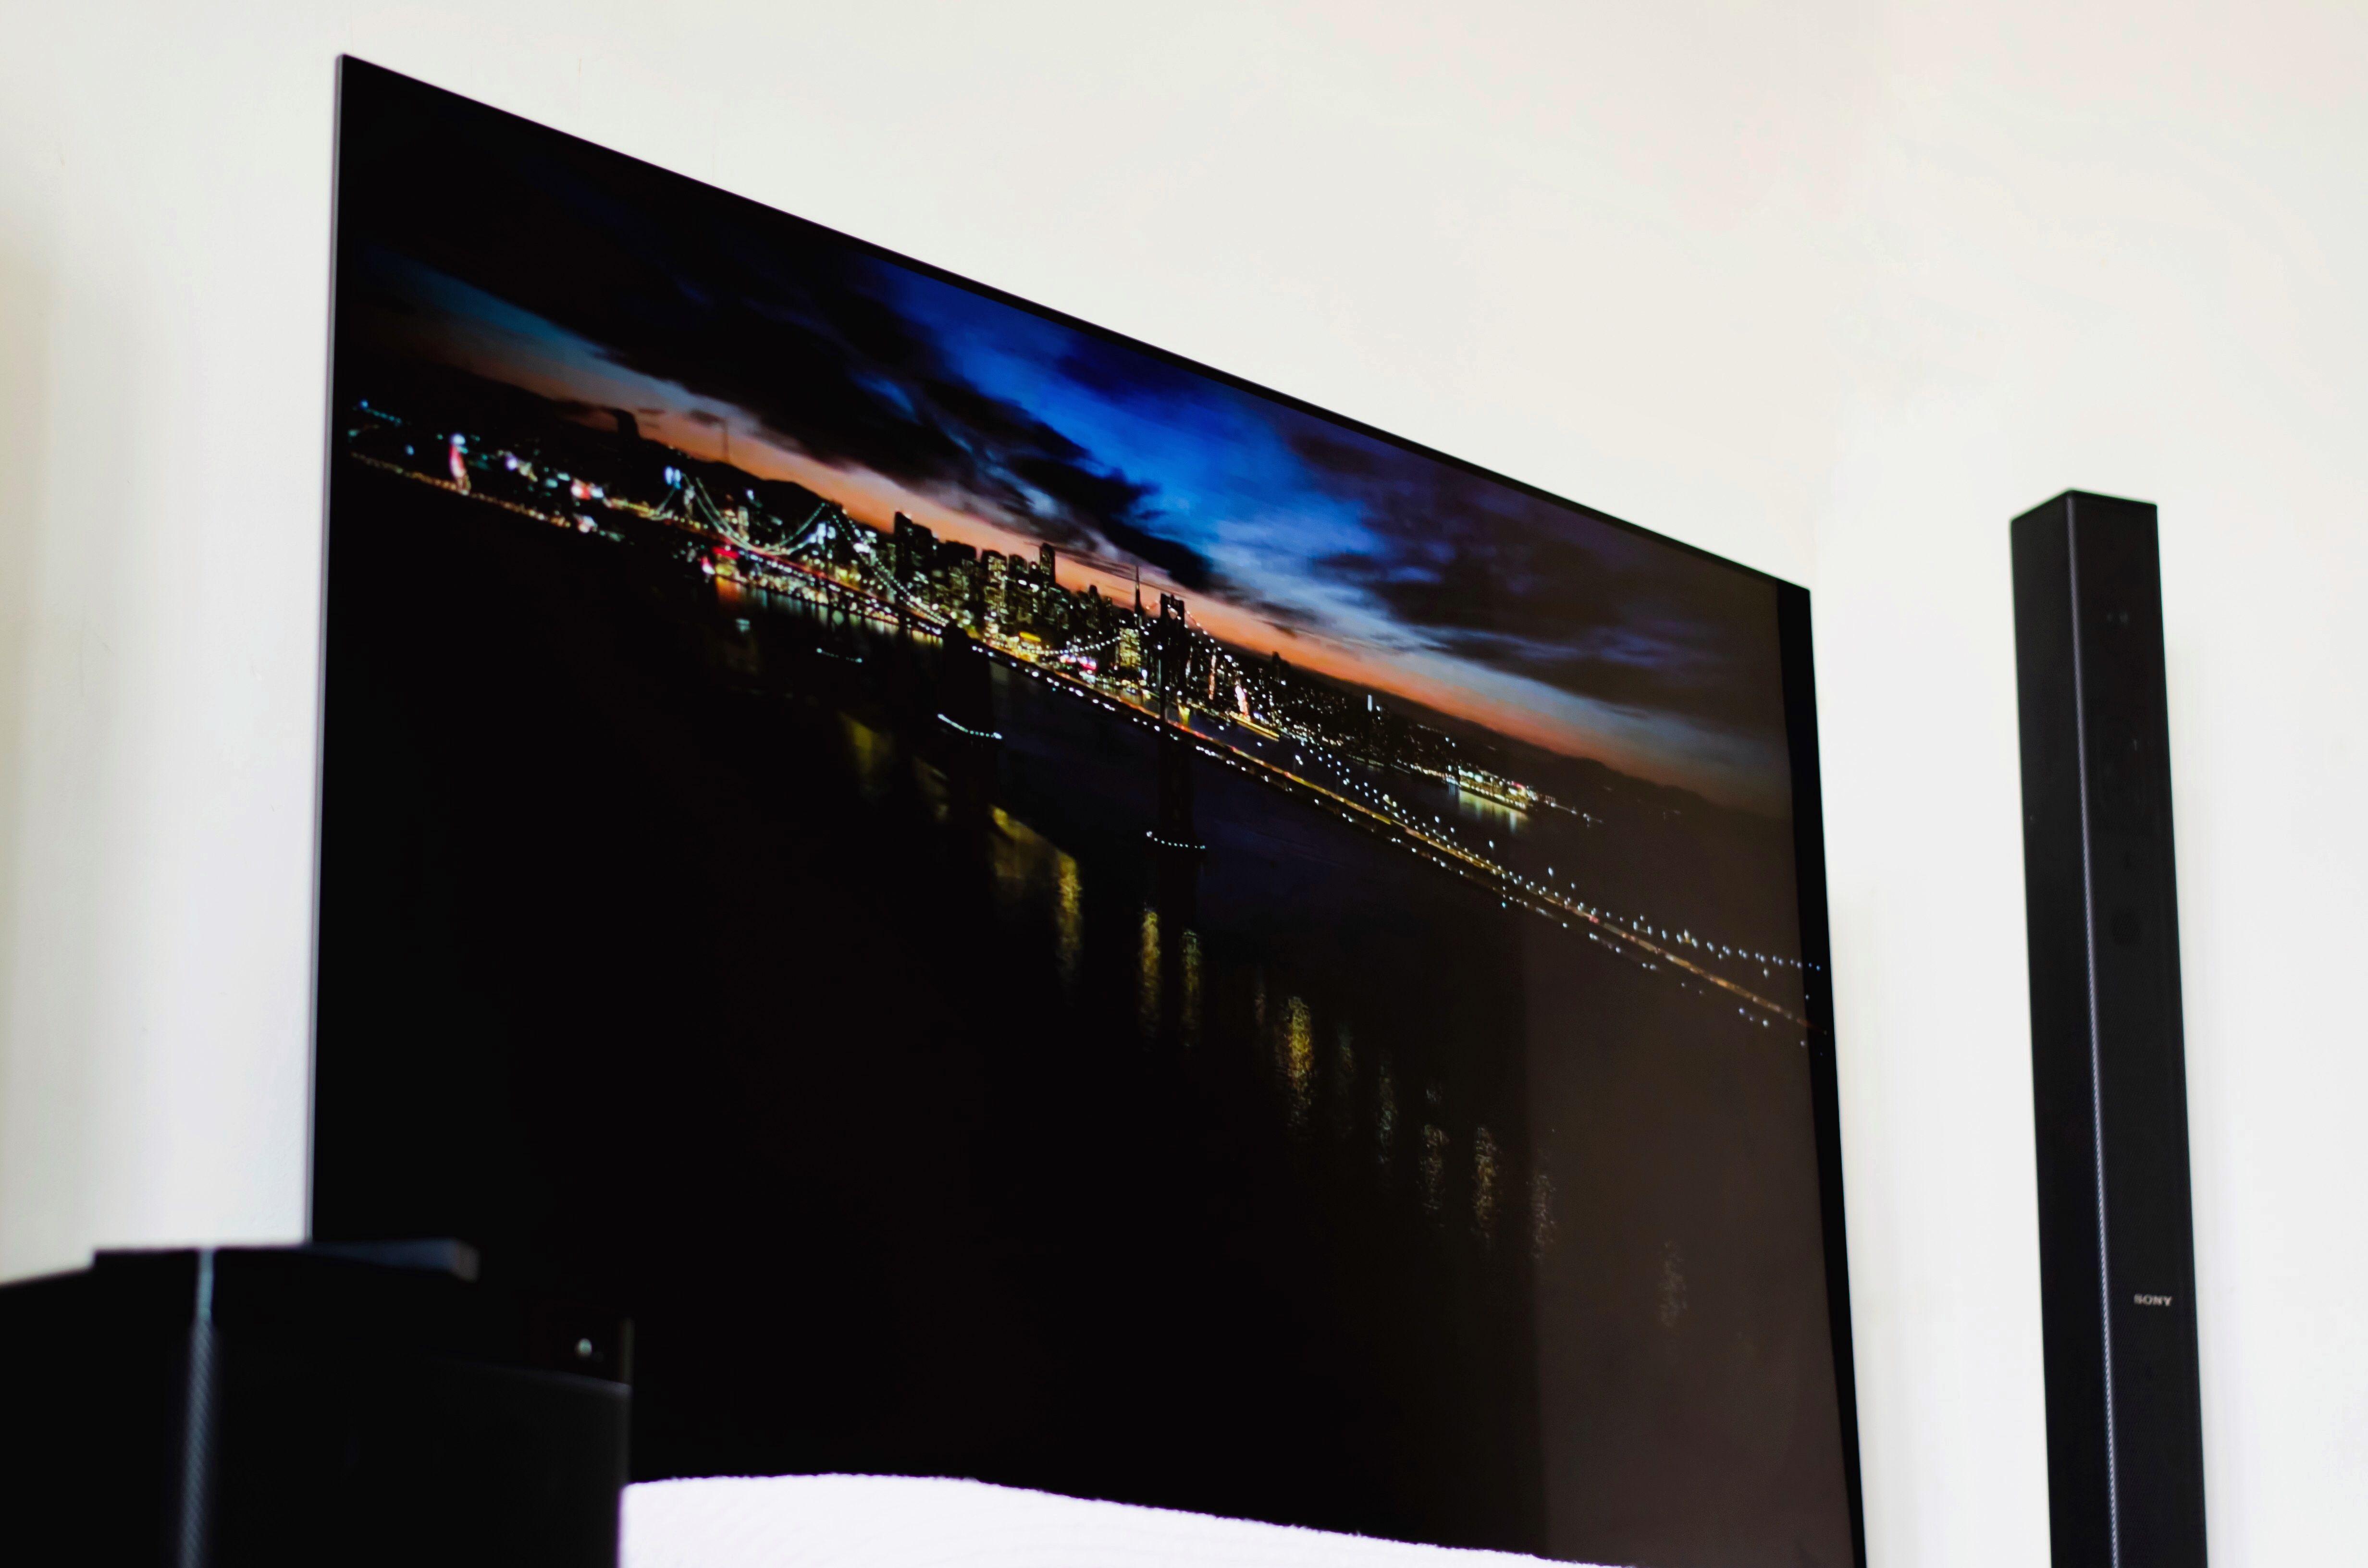 Sony A8f Oled Tv Tvs Sony New Technology